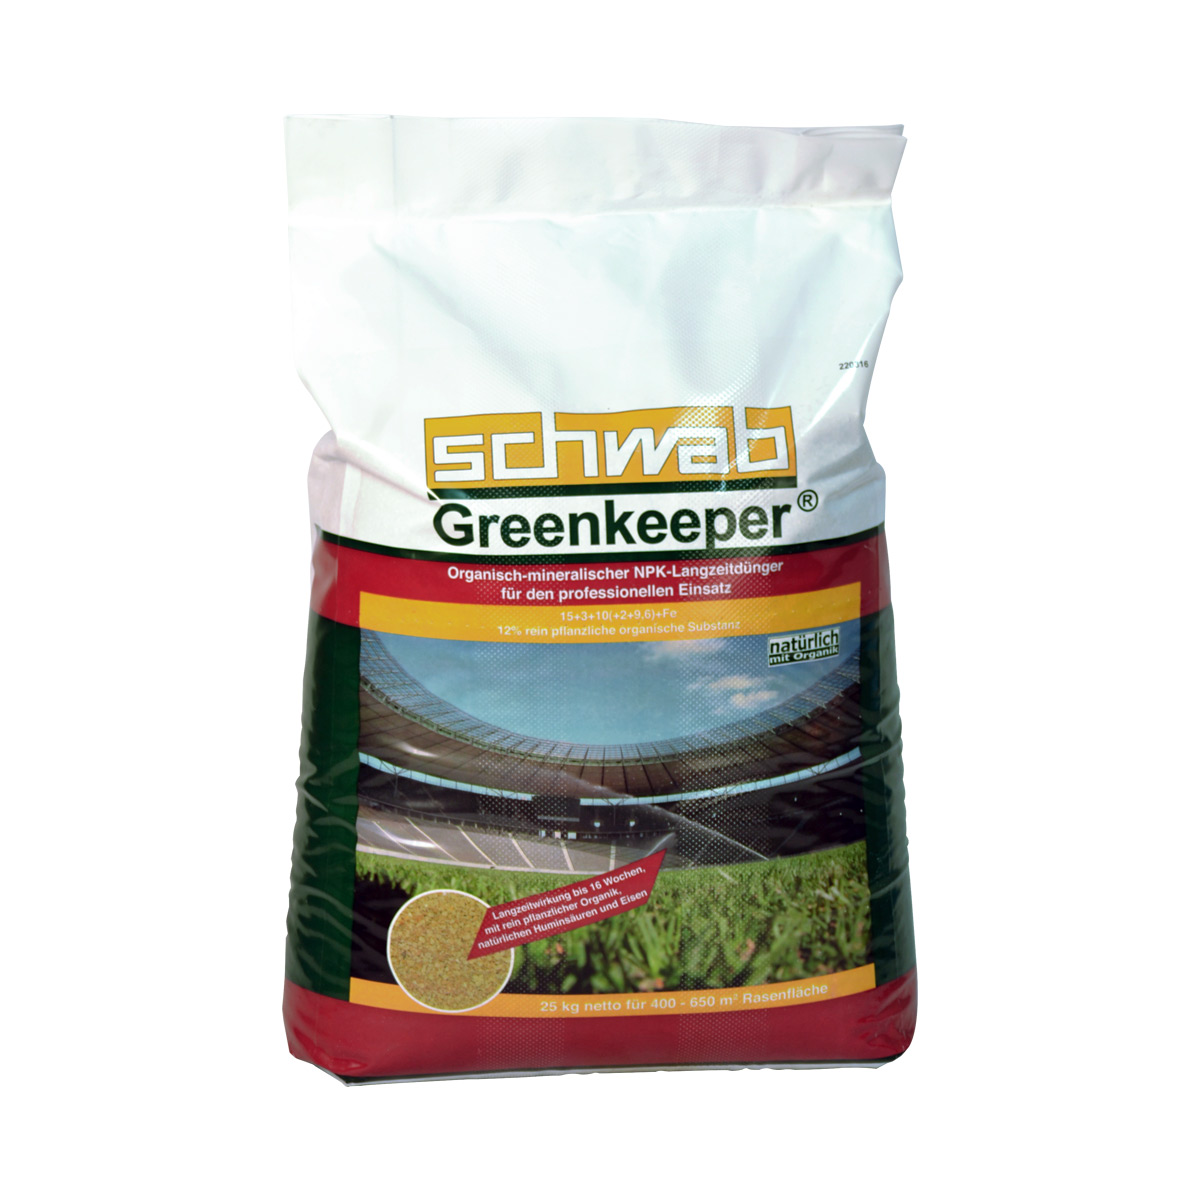 Greenkeeper (25 kg)